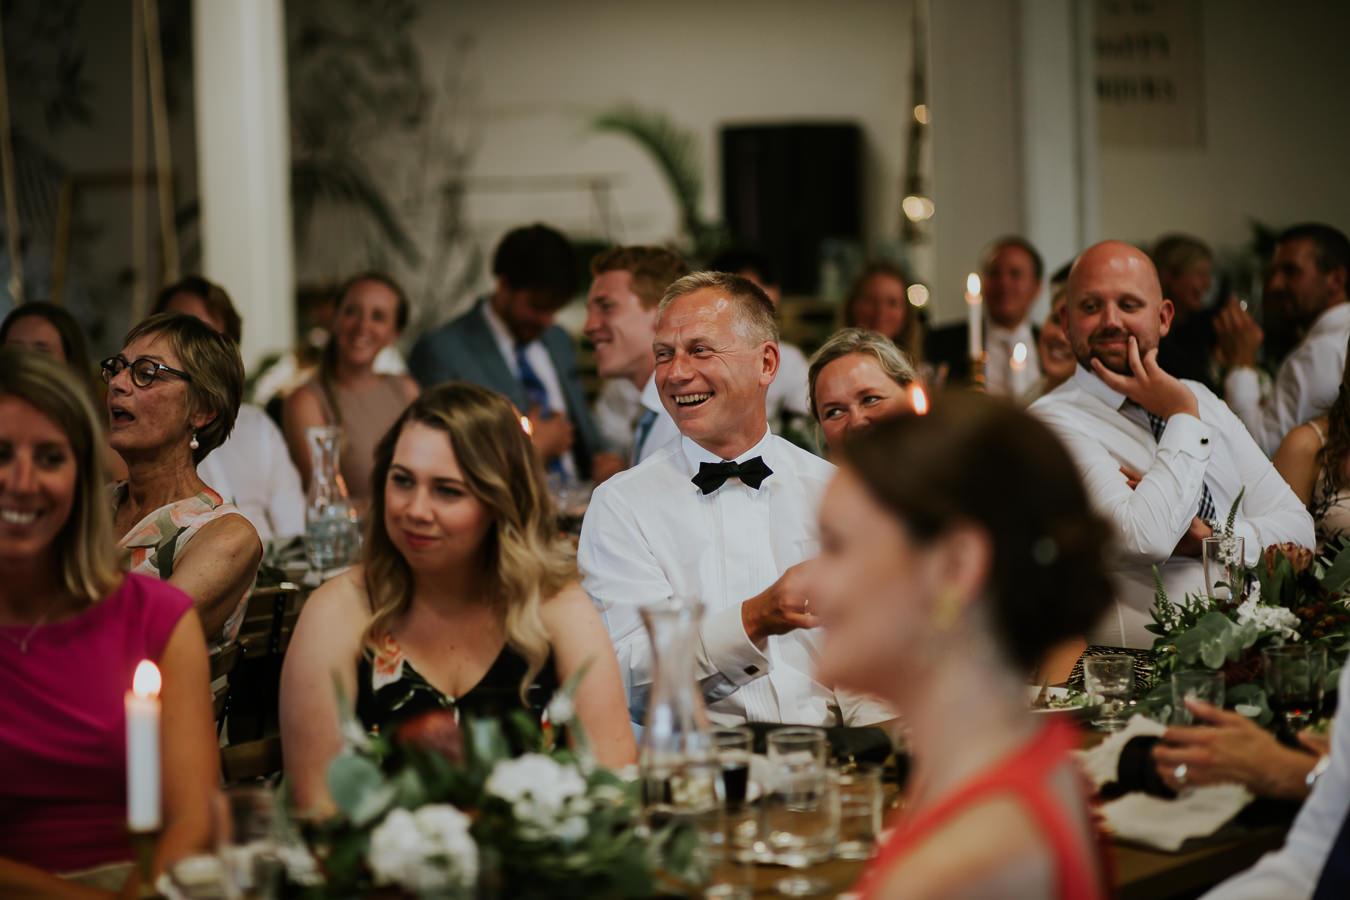 Bryllup-Lageret-Tofte-bryllupsfotograf-164.jpg